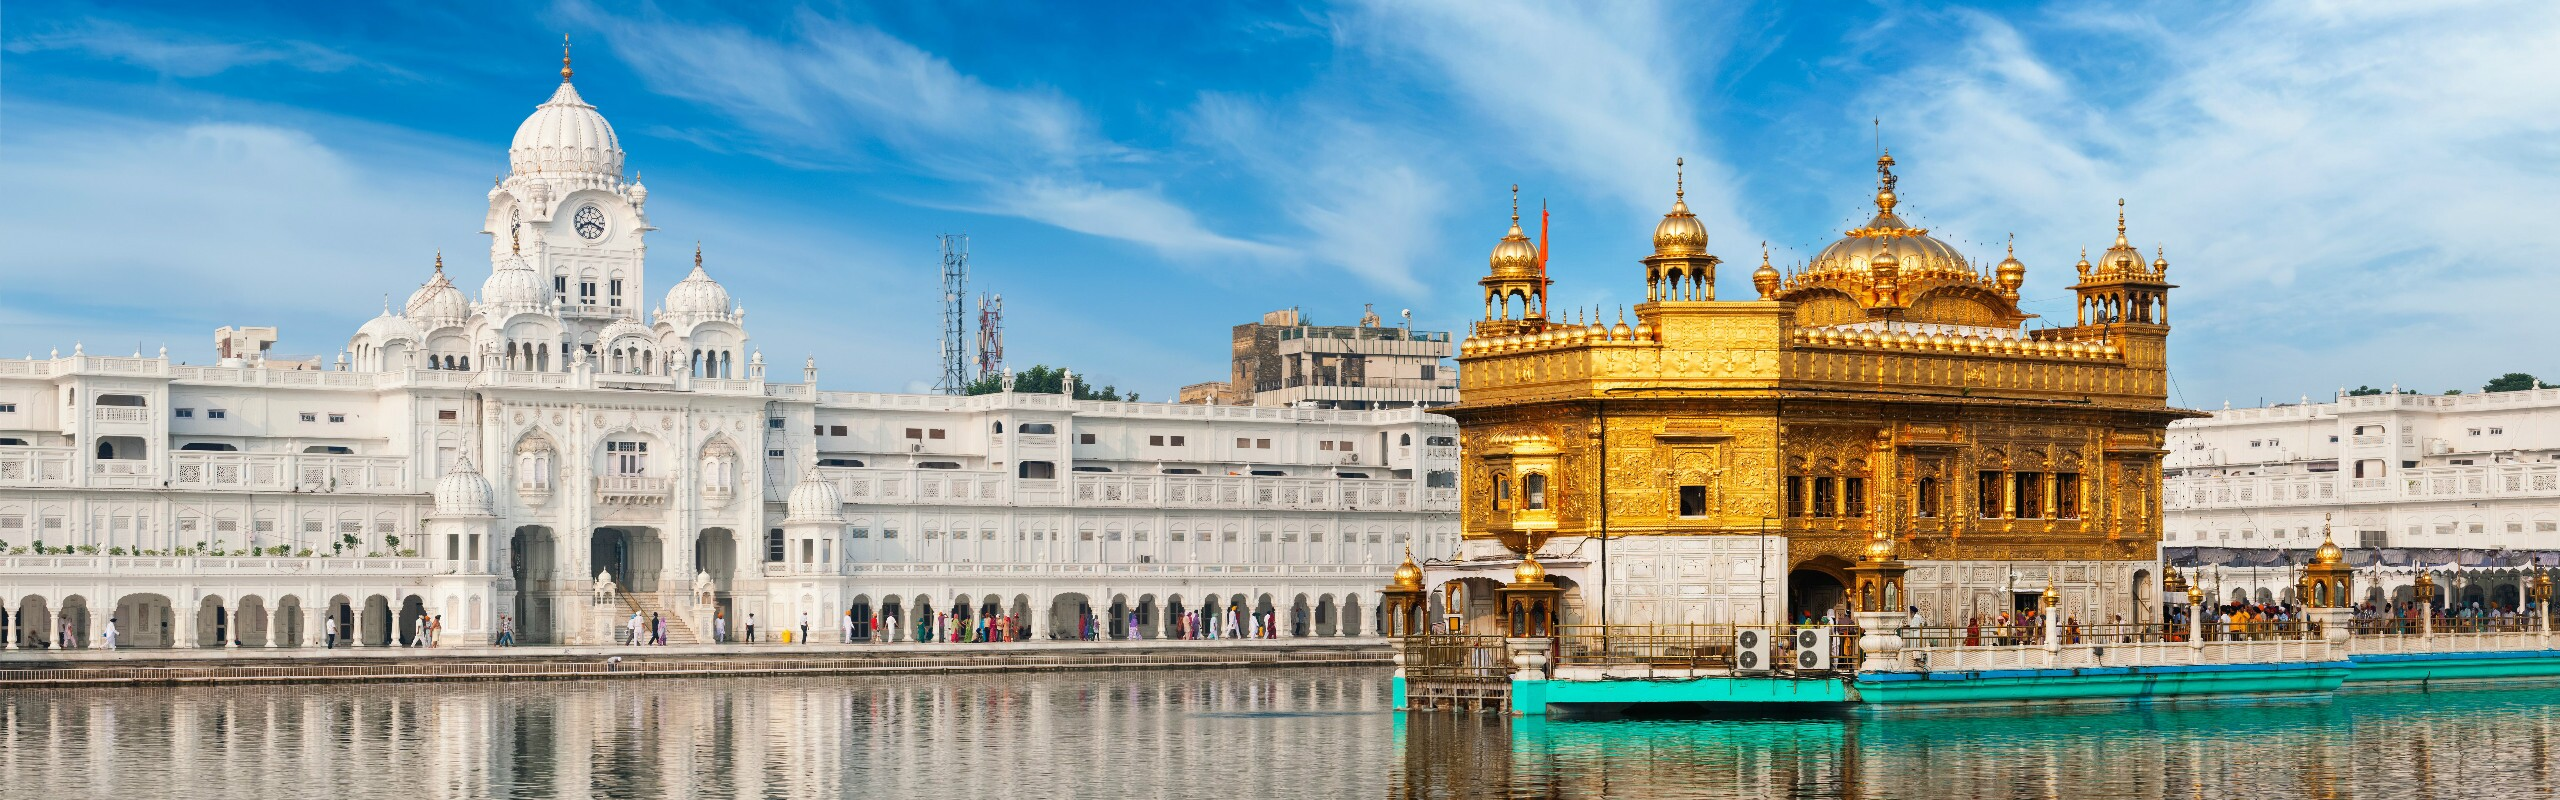 Top 12 Places to Visit in Punjab